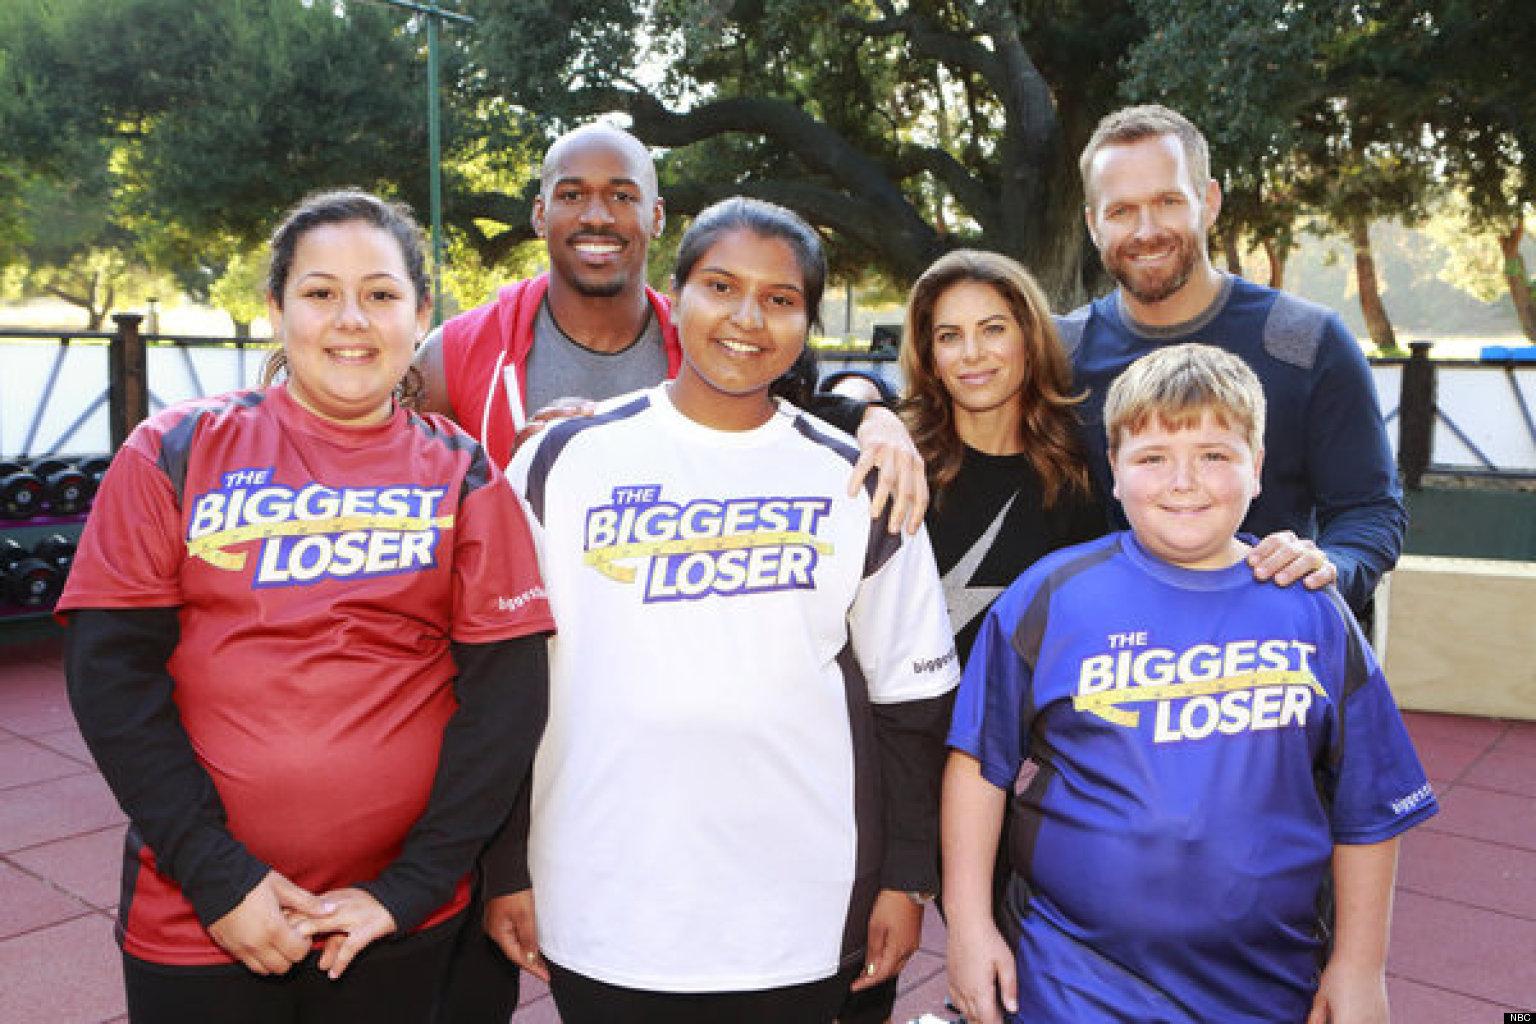 Overweight Black Kids 'The Biggest Loser' Te...